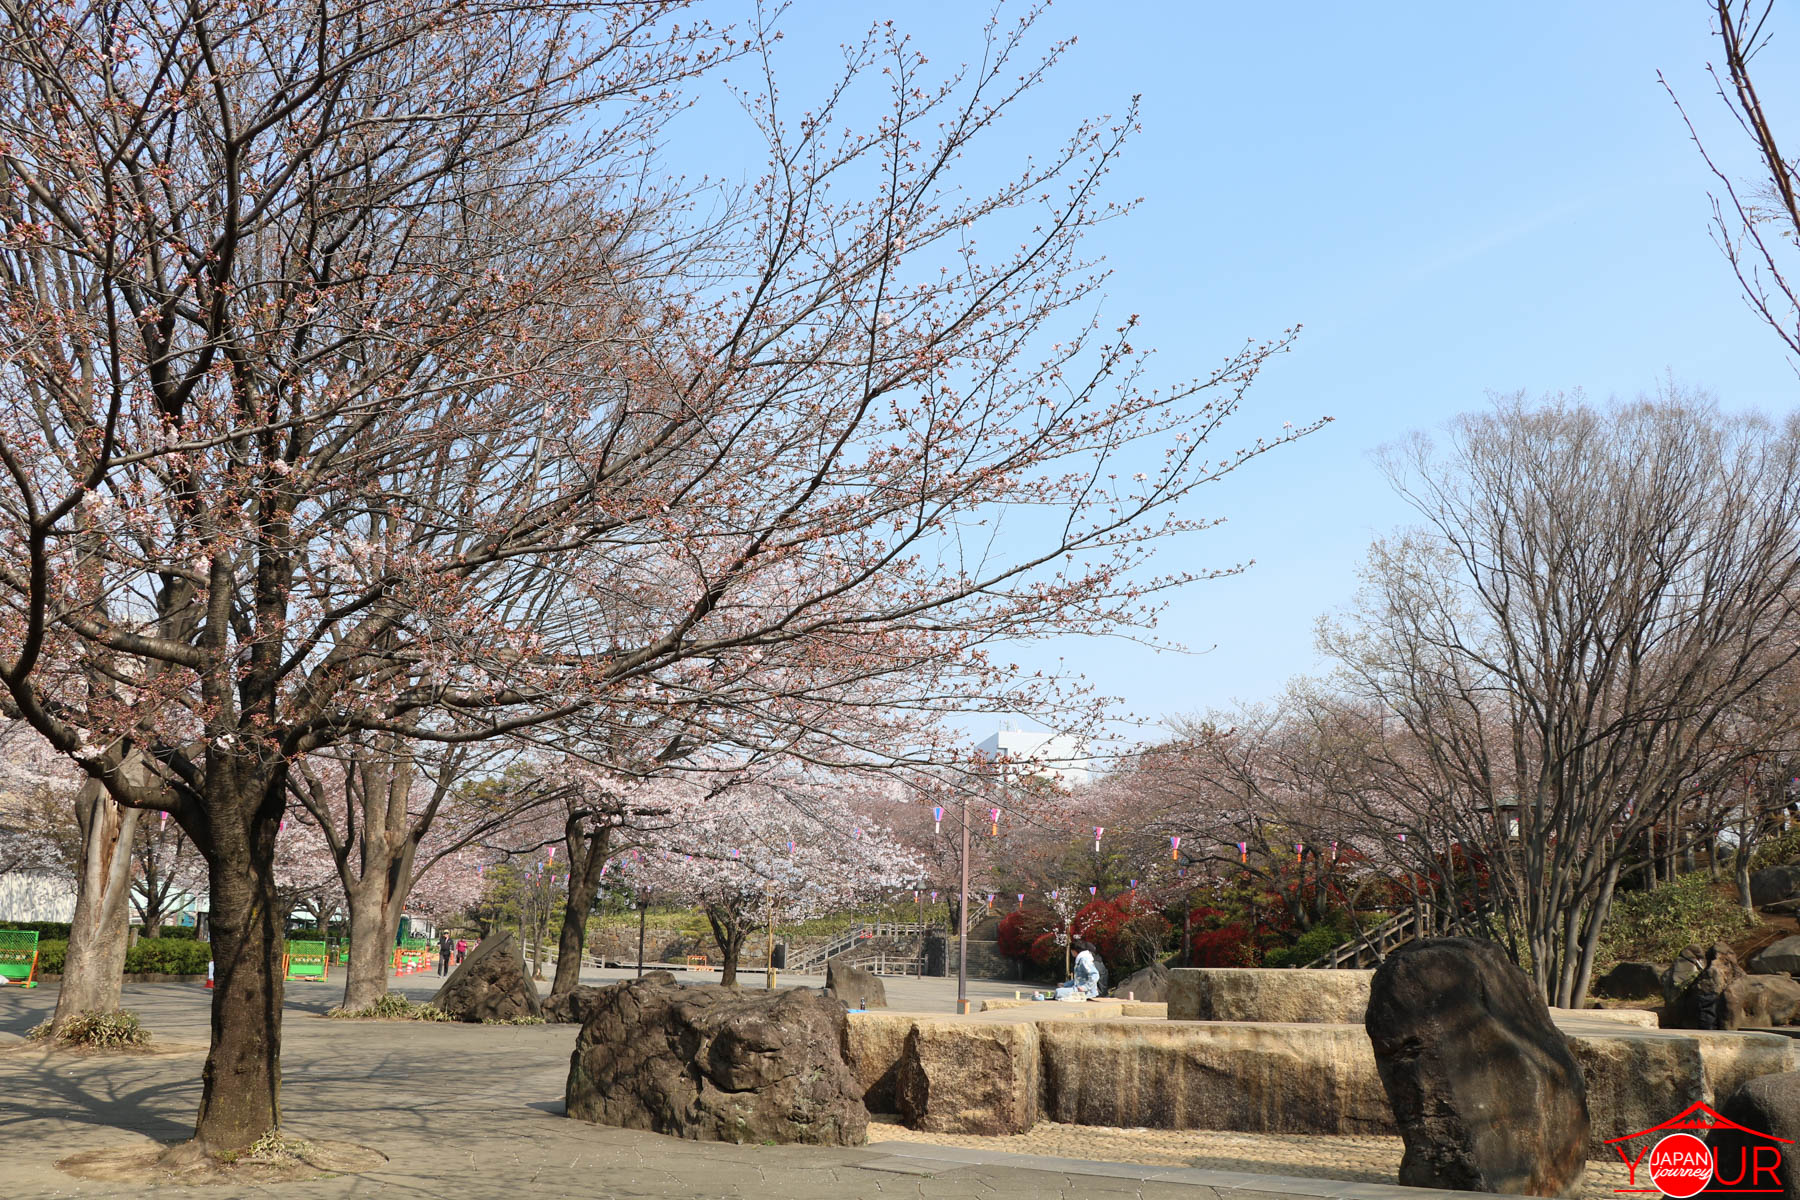 Japan Cherry Blossom Forecast 2021 - Asukayama Park